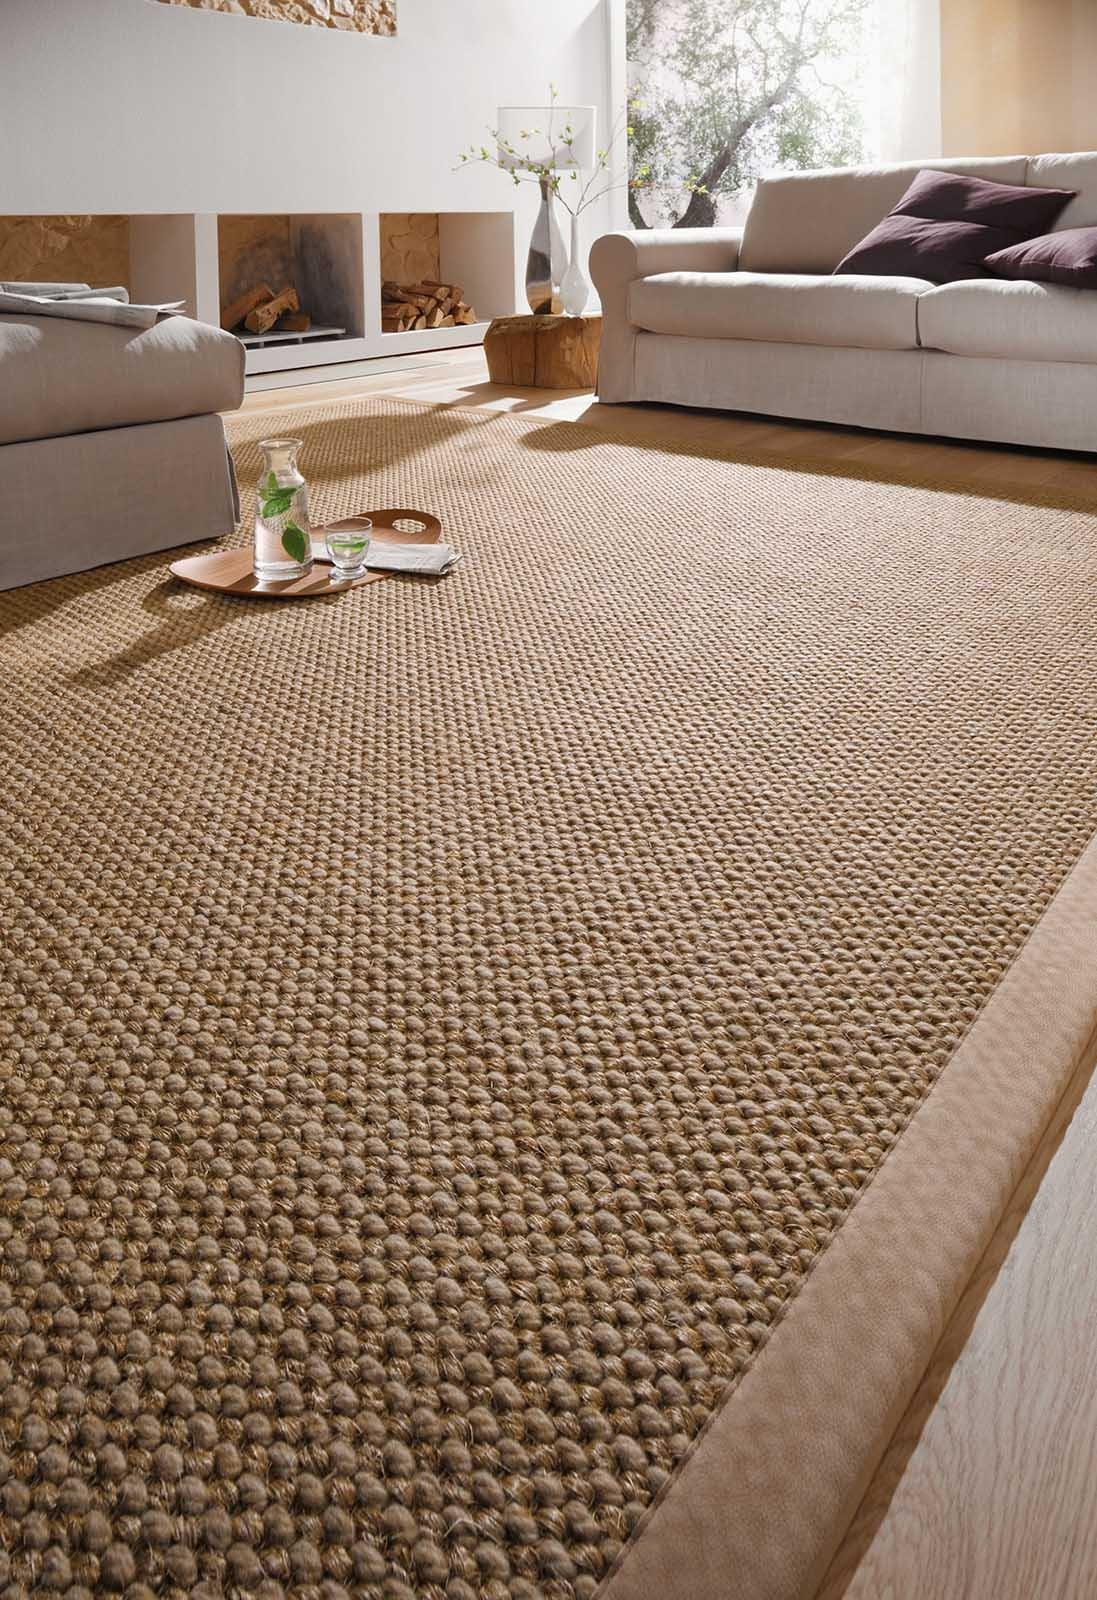 tappeti in fibre naturali cose di casa. Black Bedroom Furniture Sets. Home Design Ideas